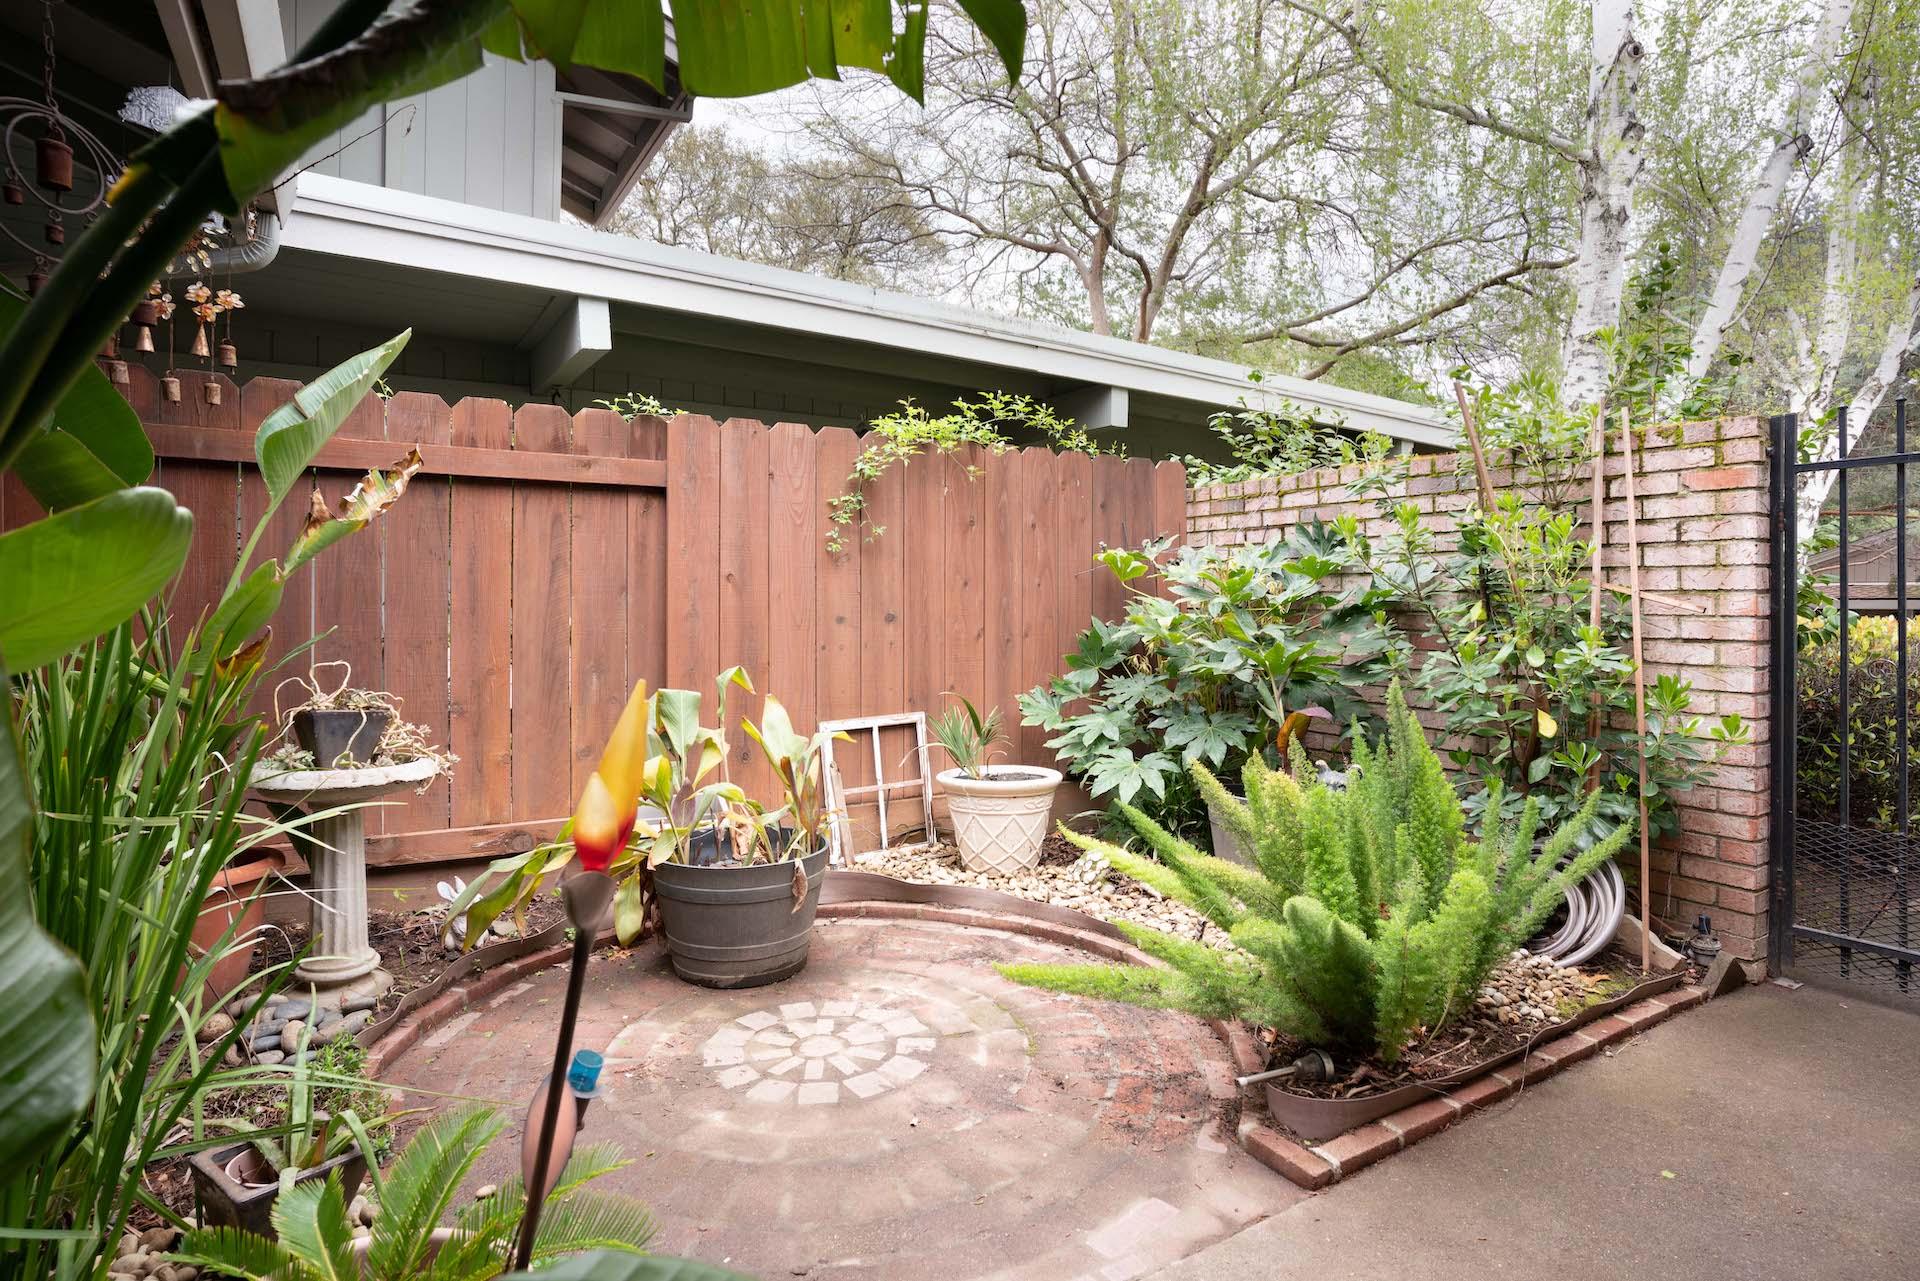 7033 La Costa Ln, Citrus Heights, Ca | Front Courtyard | Realtor In Citrus Heights